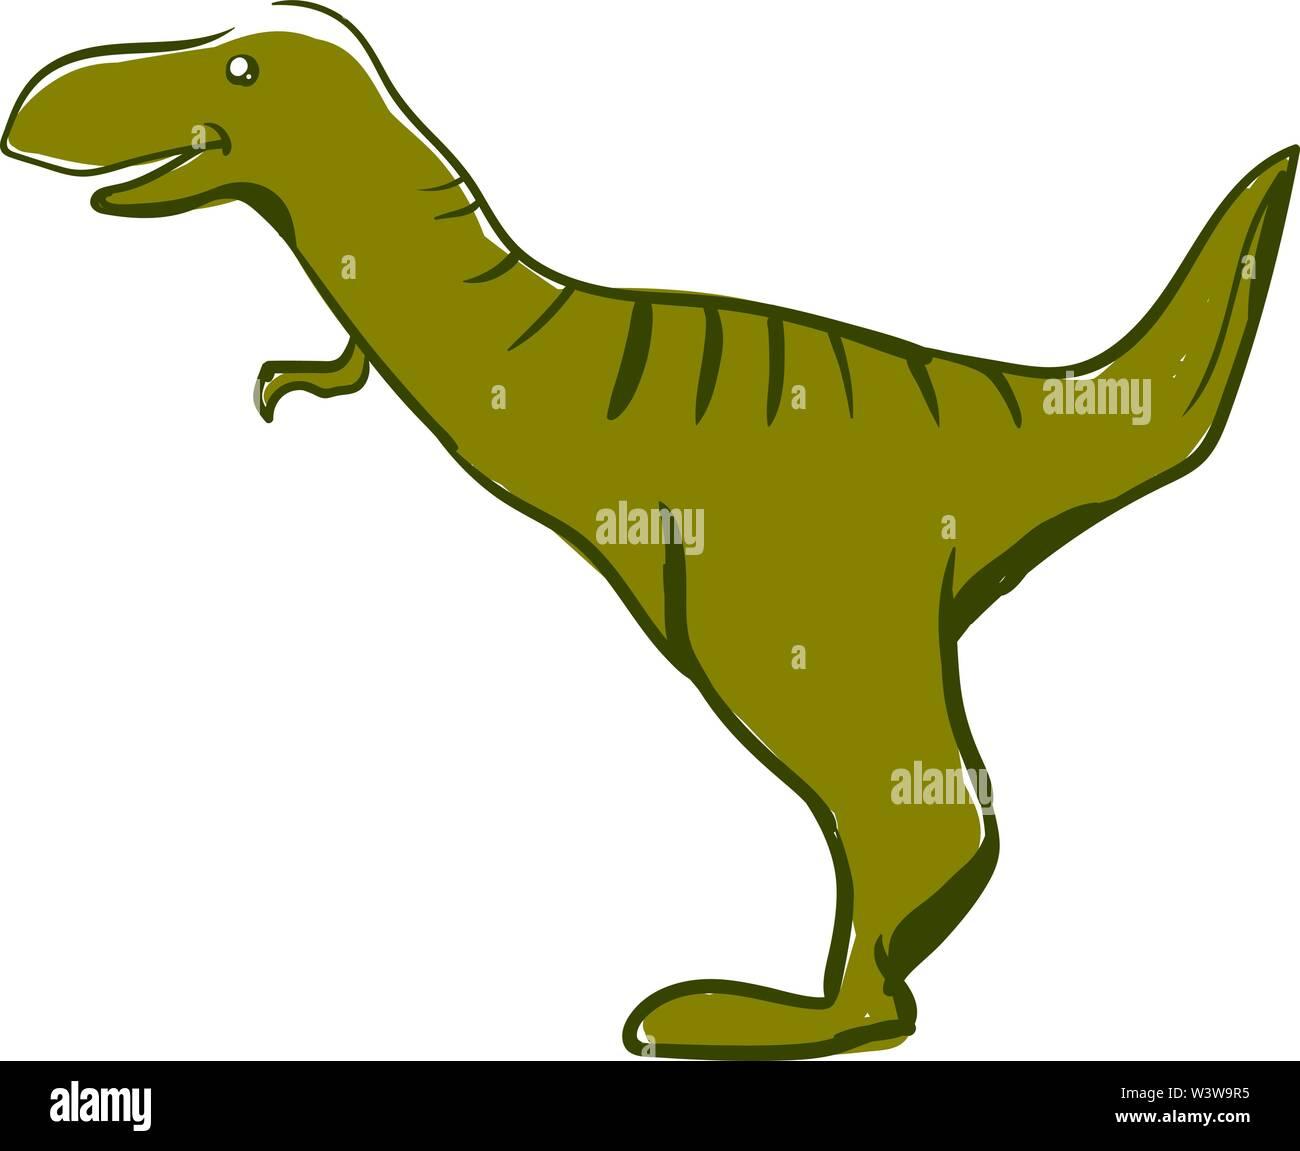 Happy green dinosaur, illustration, vector on white background. - Stock Image